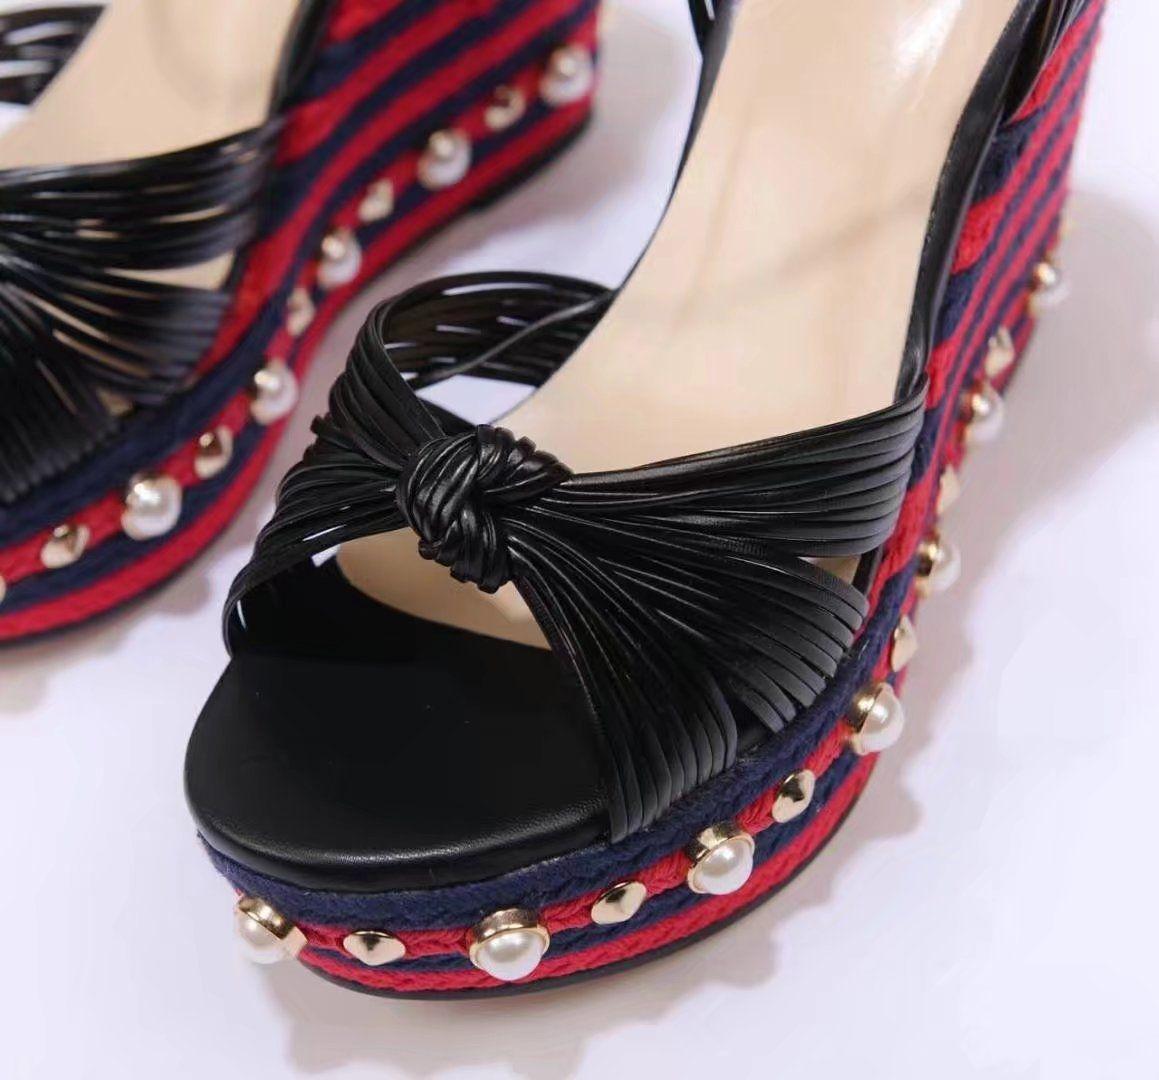 Bleu Pourpre Or Noir Rouge Femmes Wedged Sandales Plateformes Tricotées Femme Casual Sandales Mode Talons Hauts Talons Goujons Perles Sandales Mujer